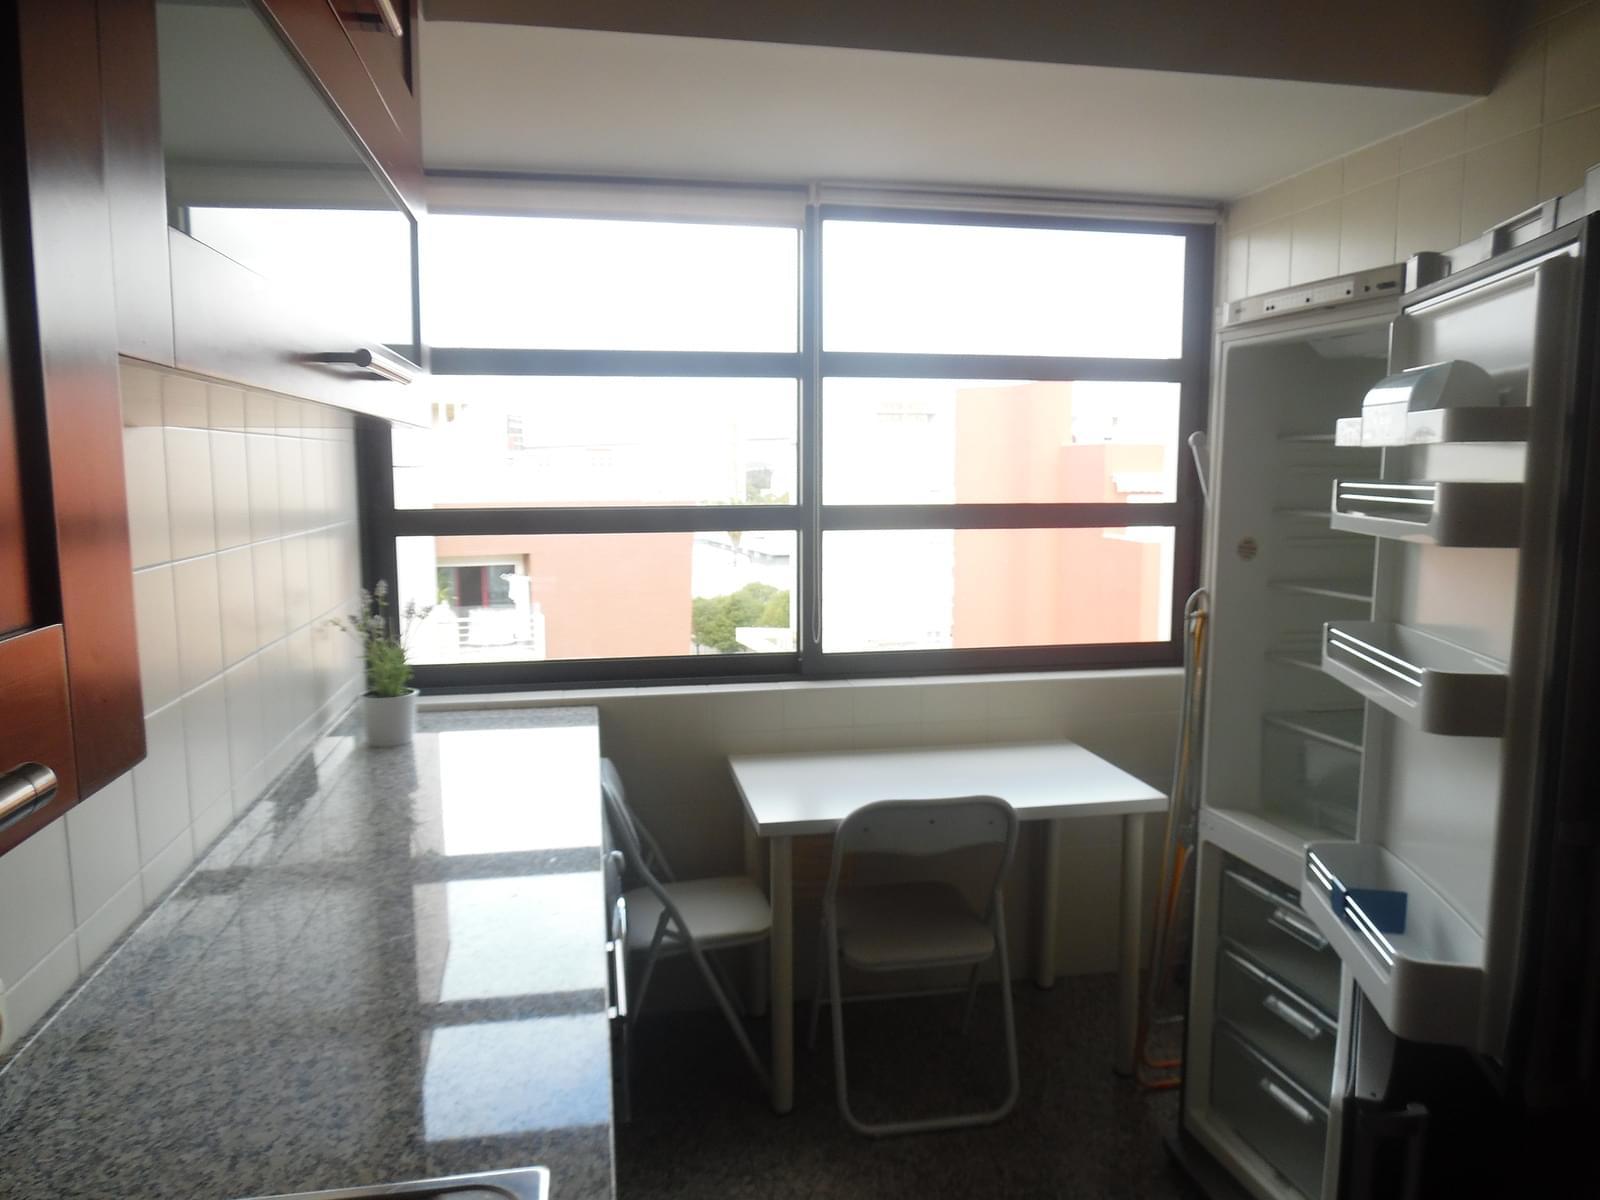 pf18329-apartamento-t1-lisboa-9ffbe98c-26c5-48d9-b72b-7a7ee40ae2c8